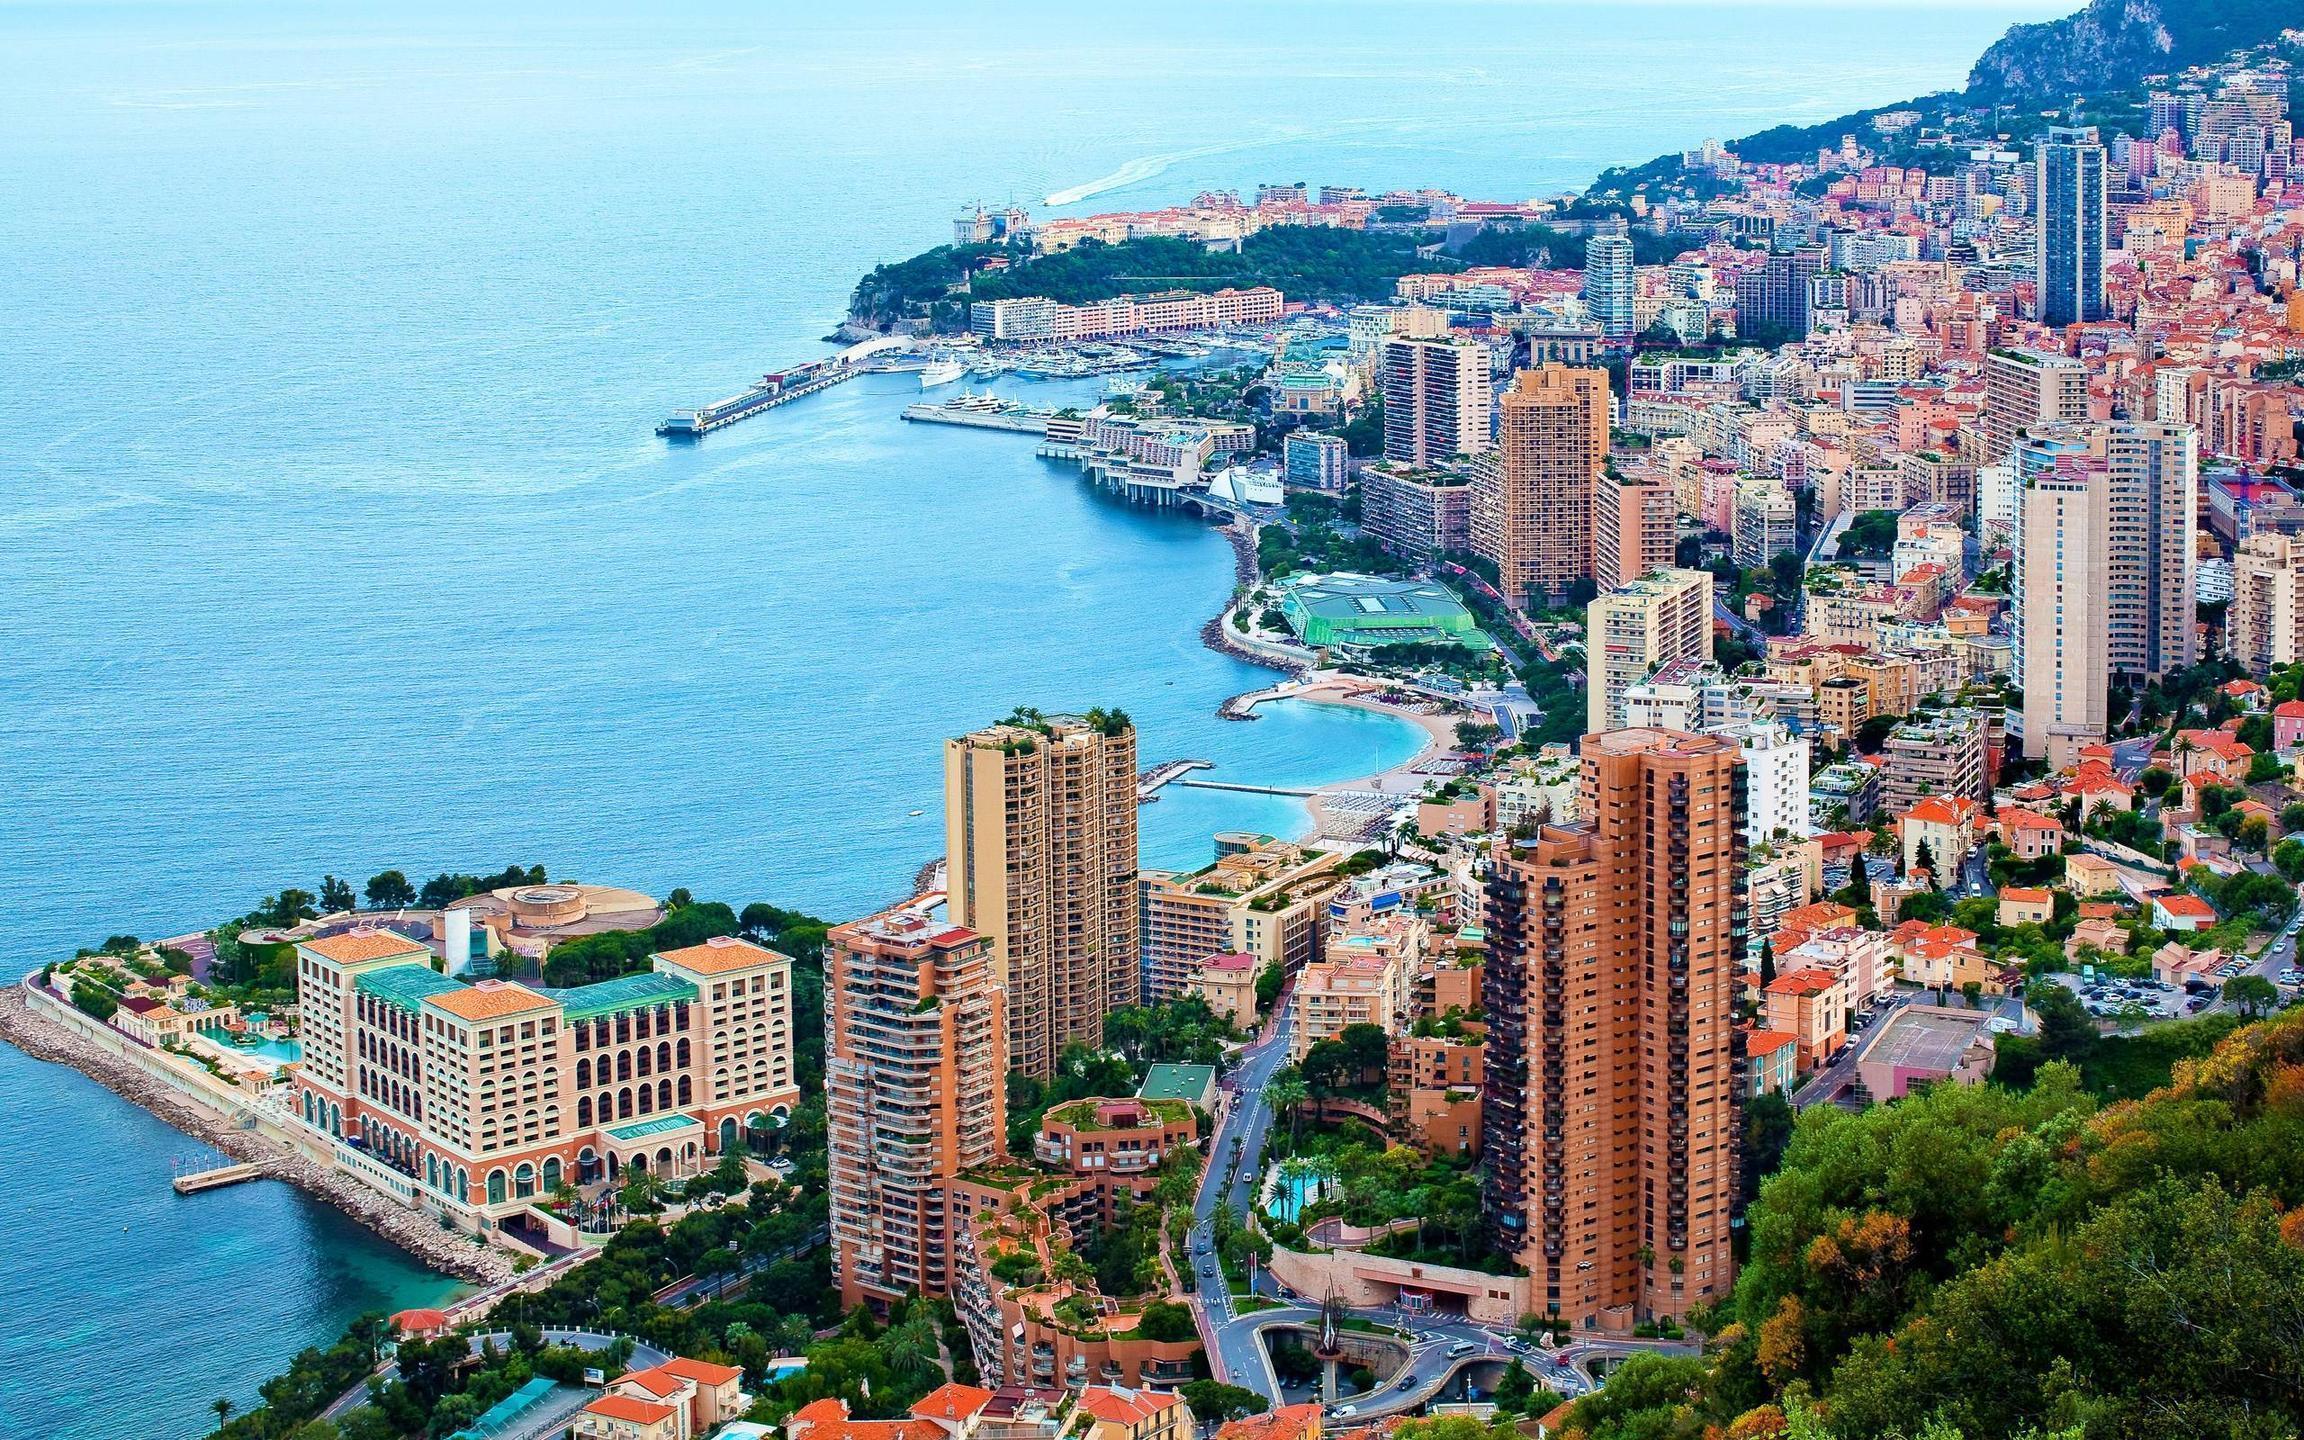 Monaco wallpapers wallpaper cave - Photo of wallpaper ...